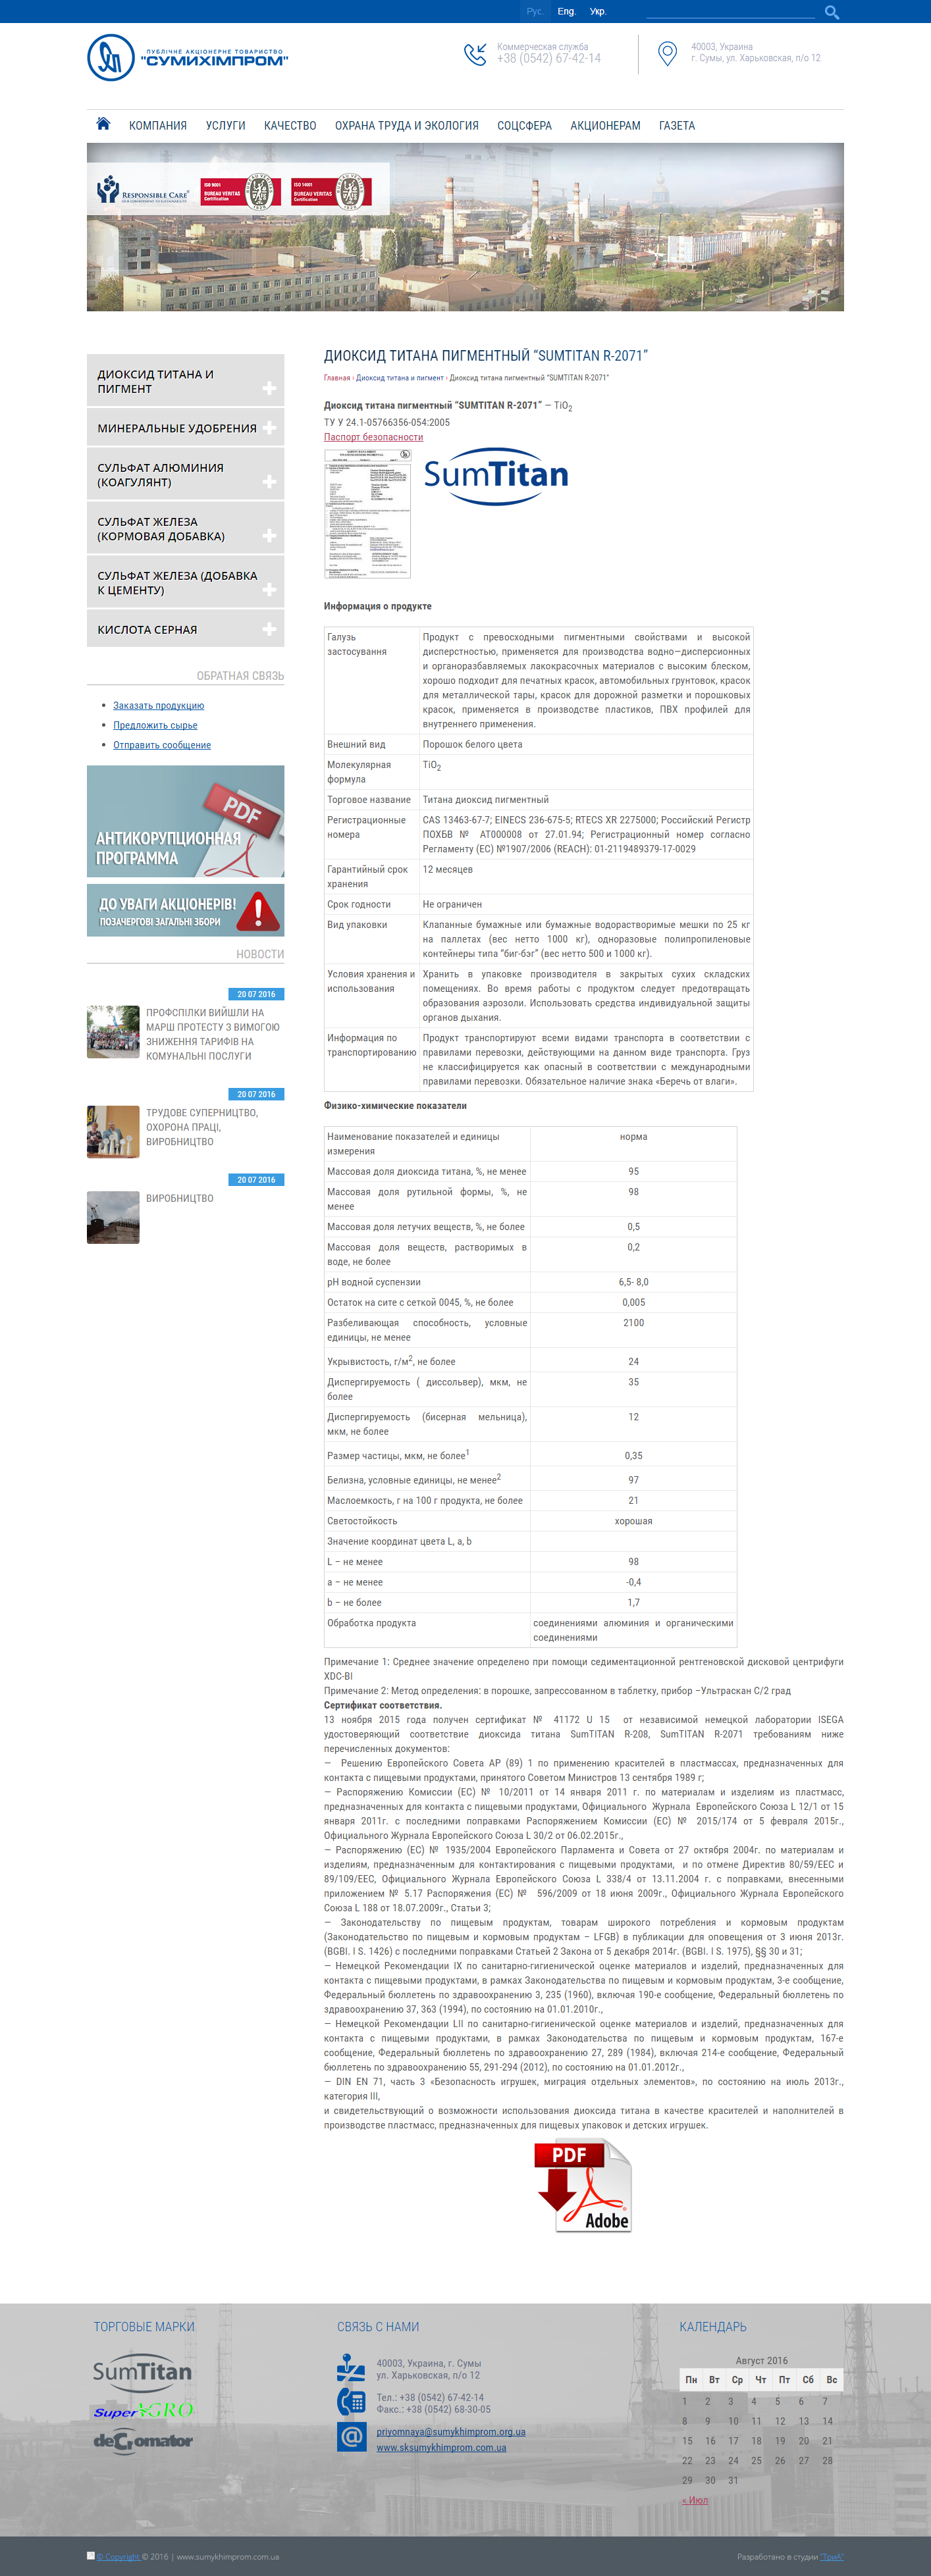 sumykhimprom.com.ua screen capture 2016-08-02_15-00-05